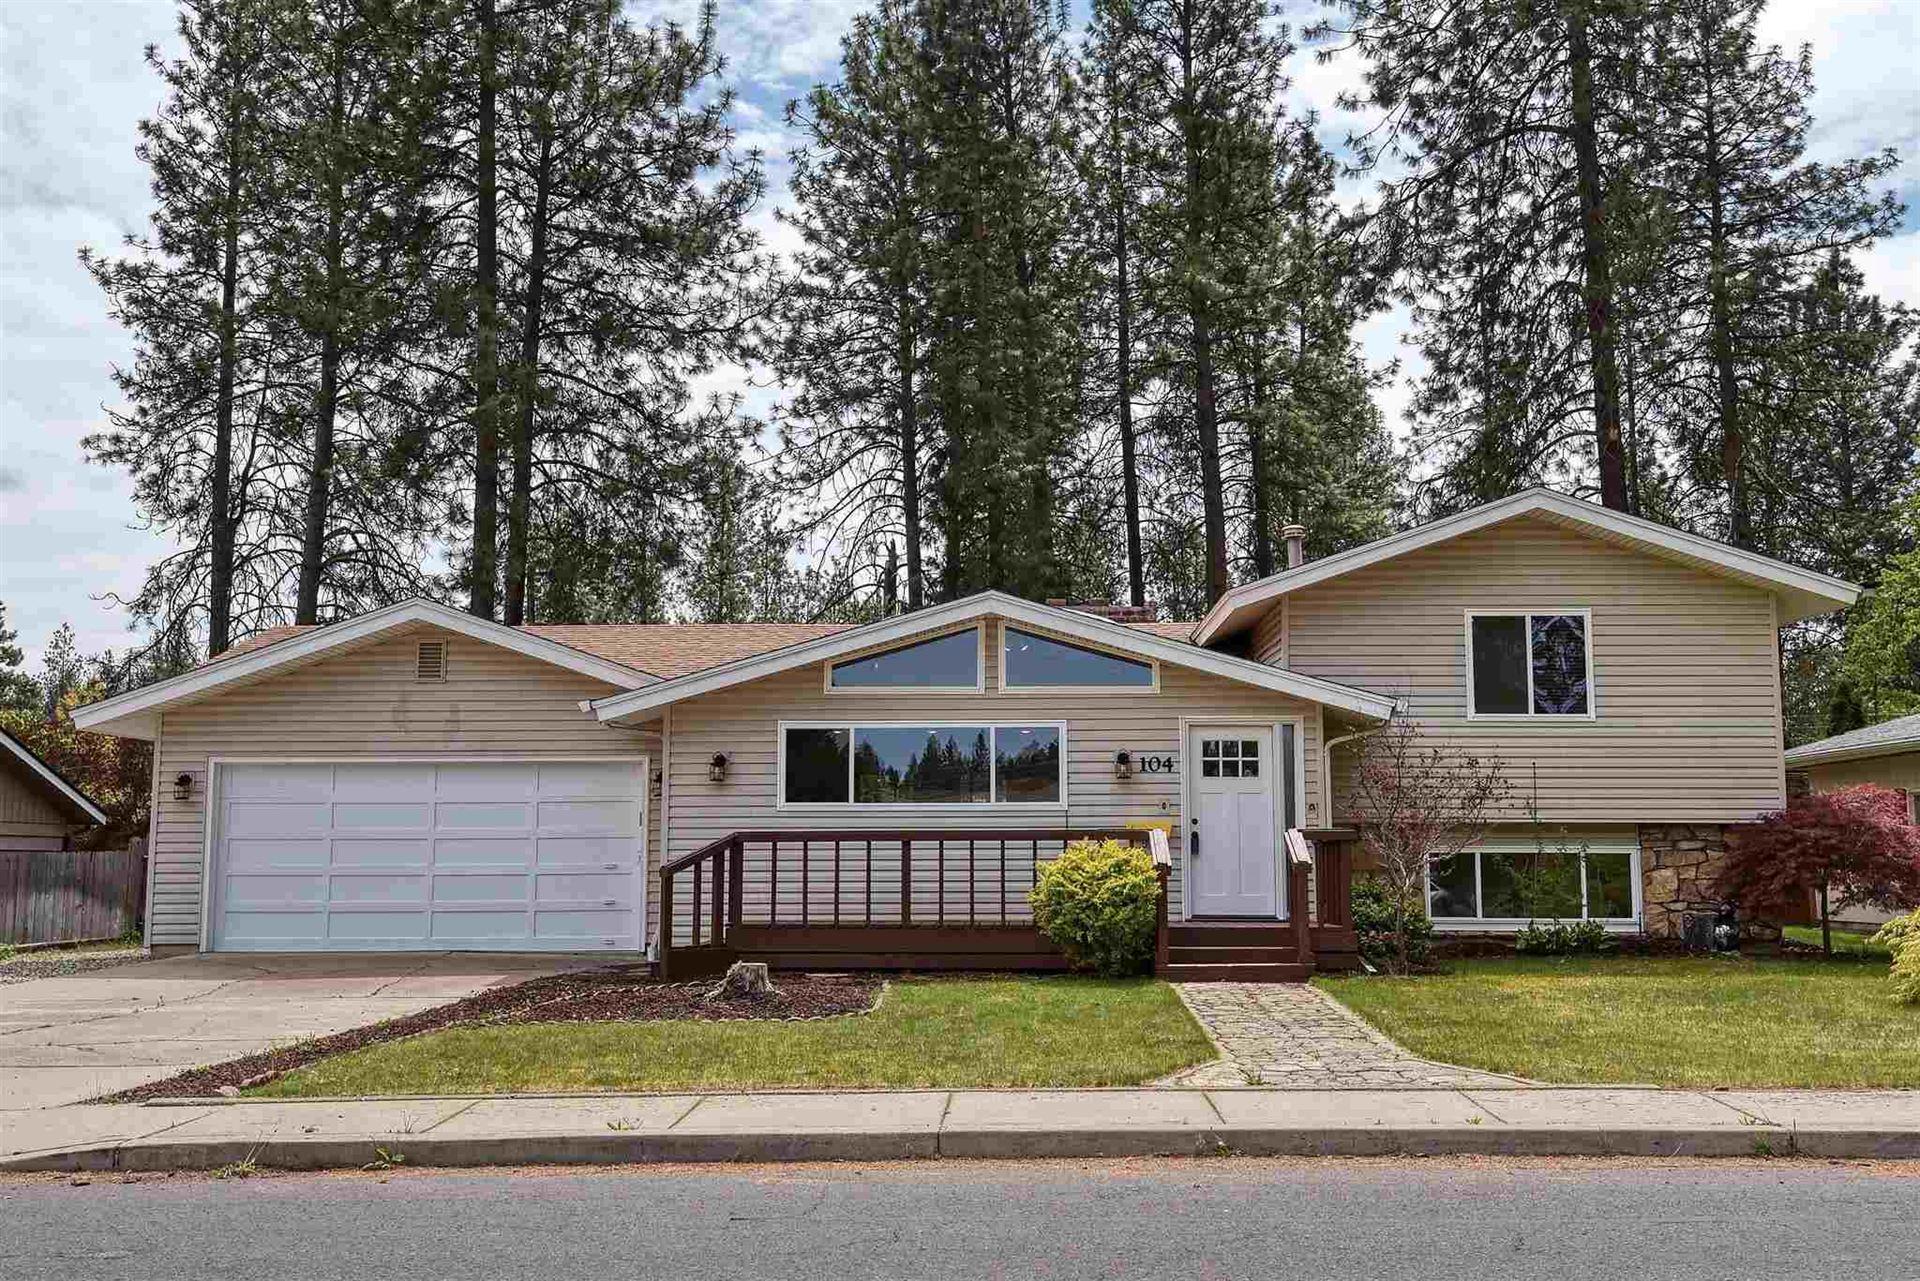 104 E Regina Ave, Spokane, WA 99218-1915 - #: 202115540